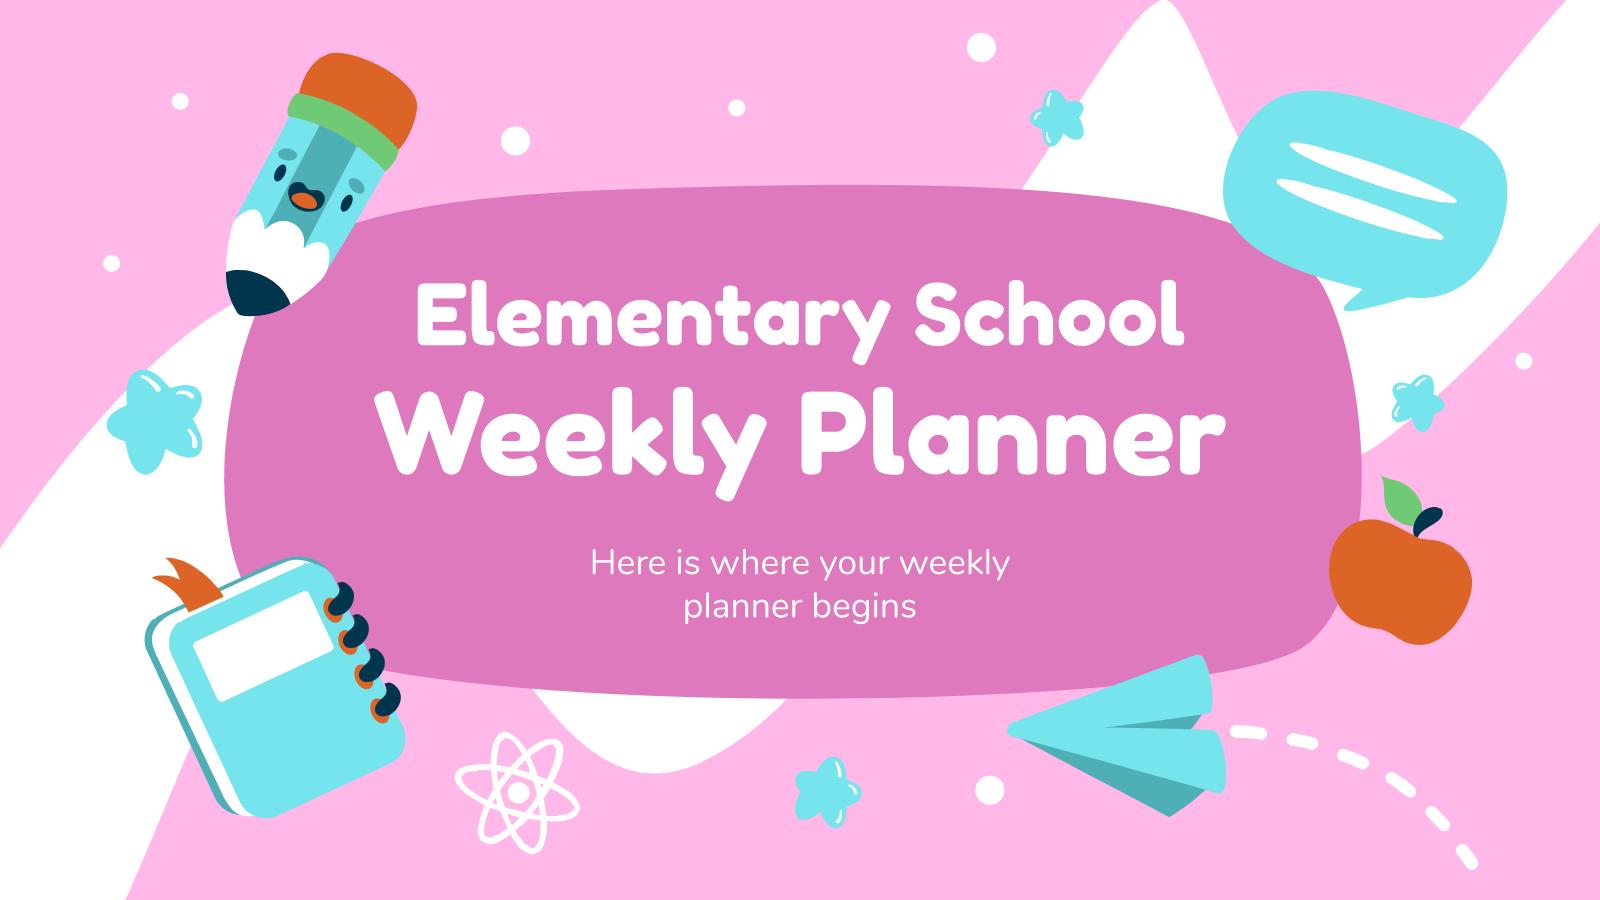 Elementary School Weekly Planner presentation template